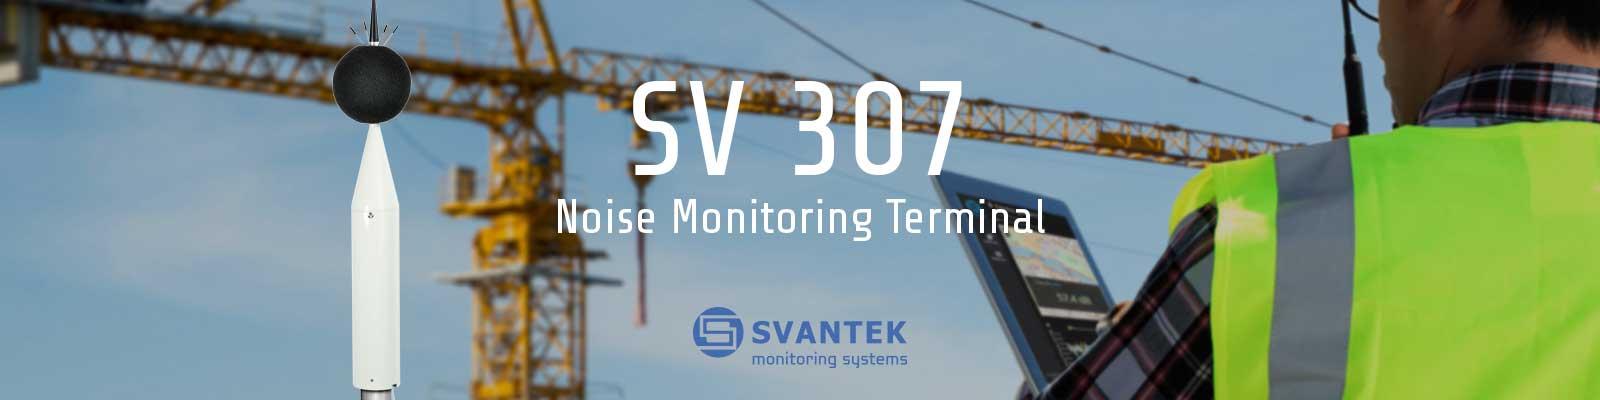 SV307